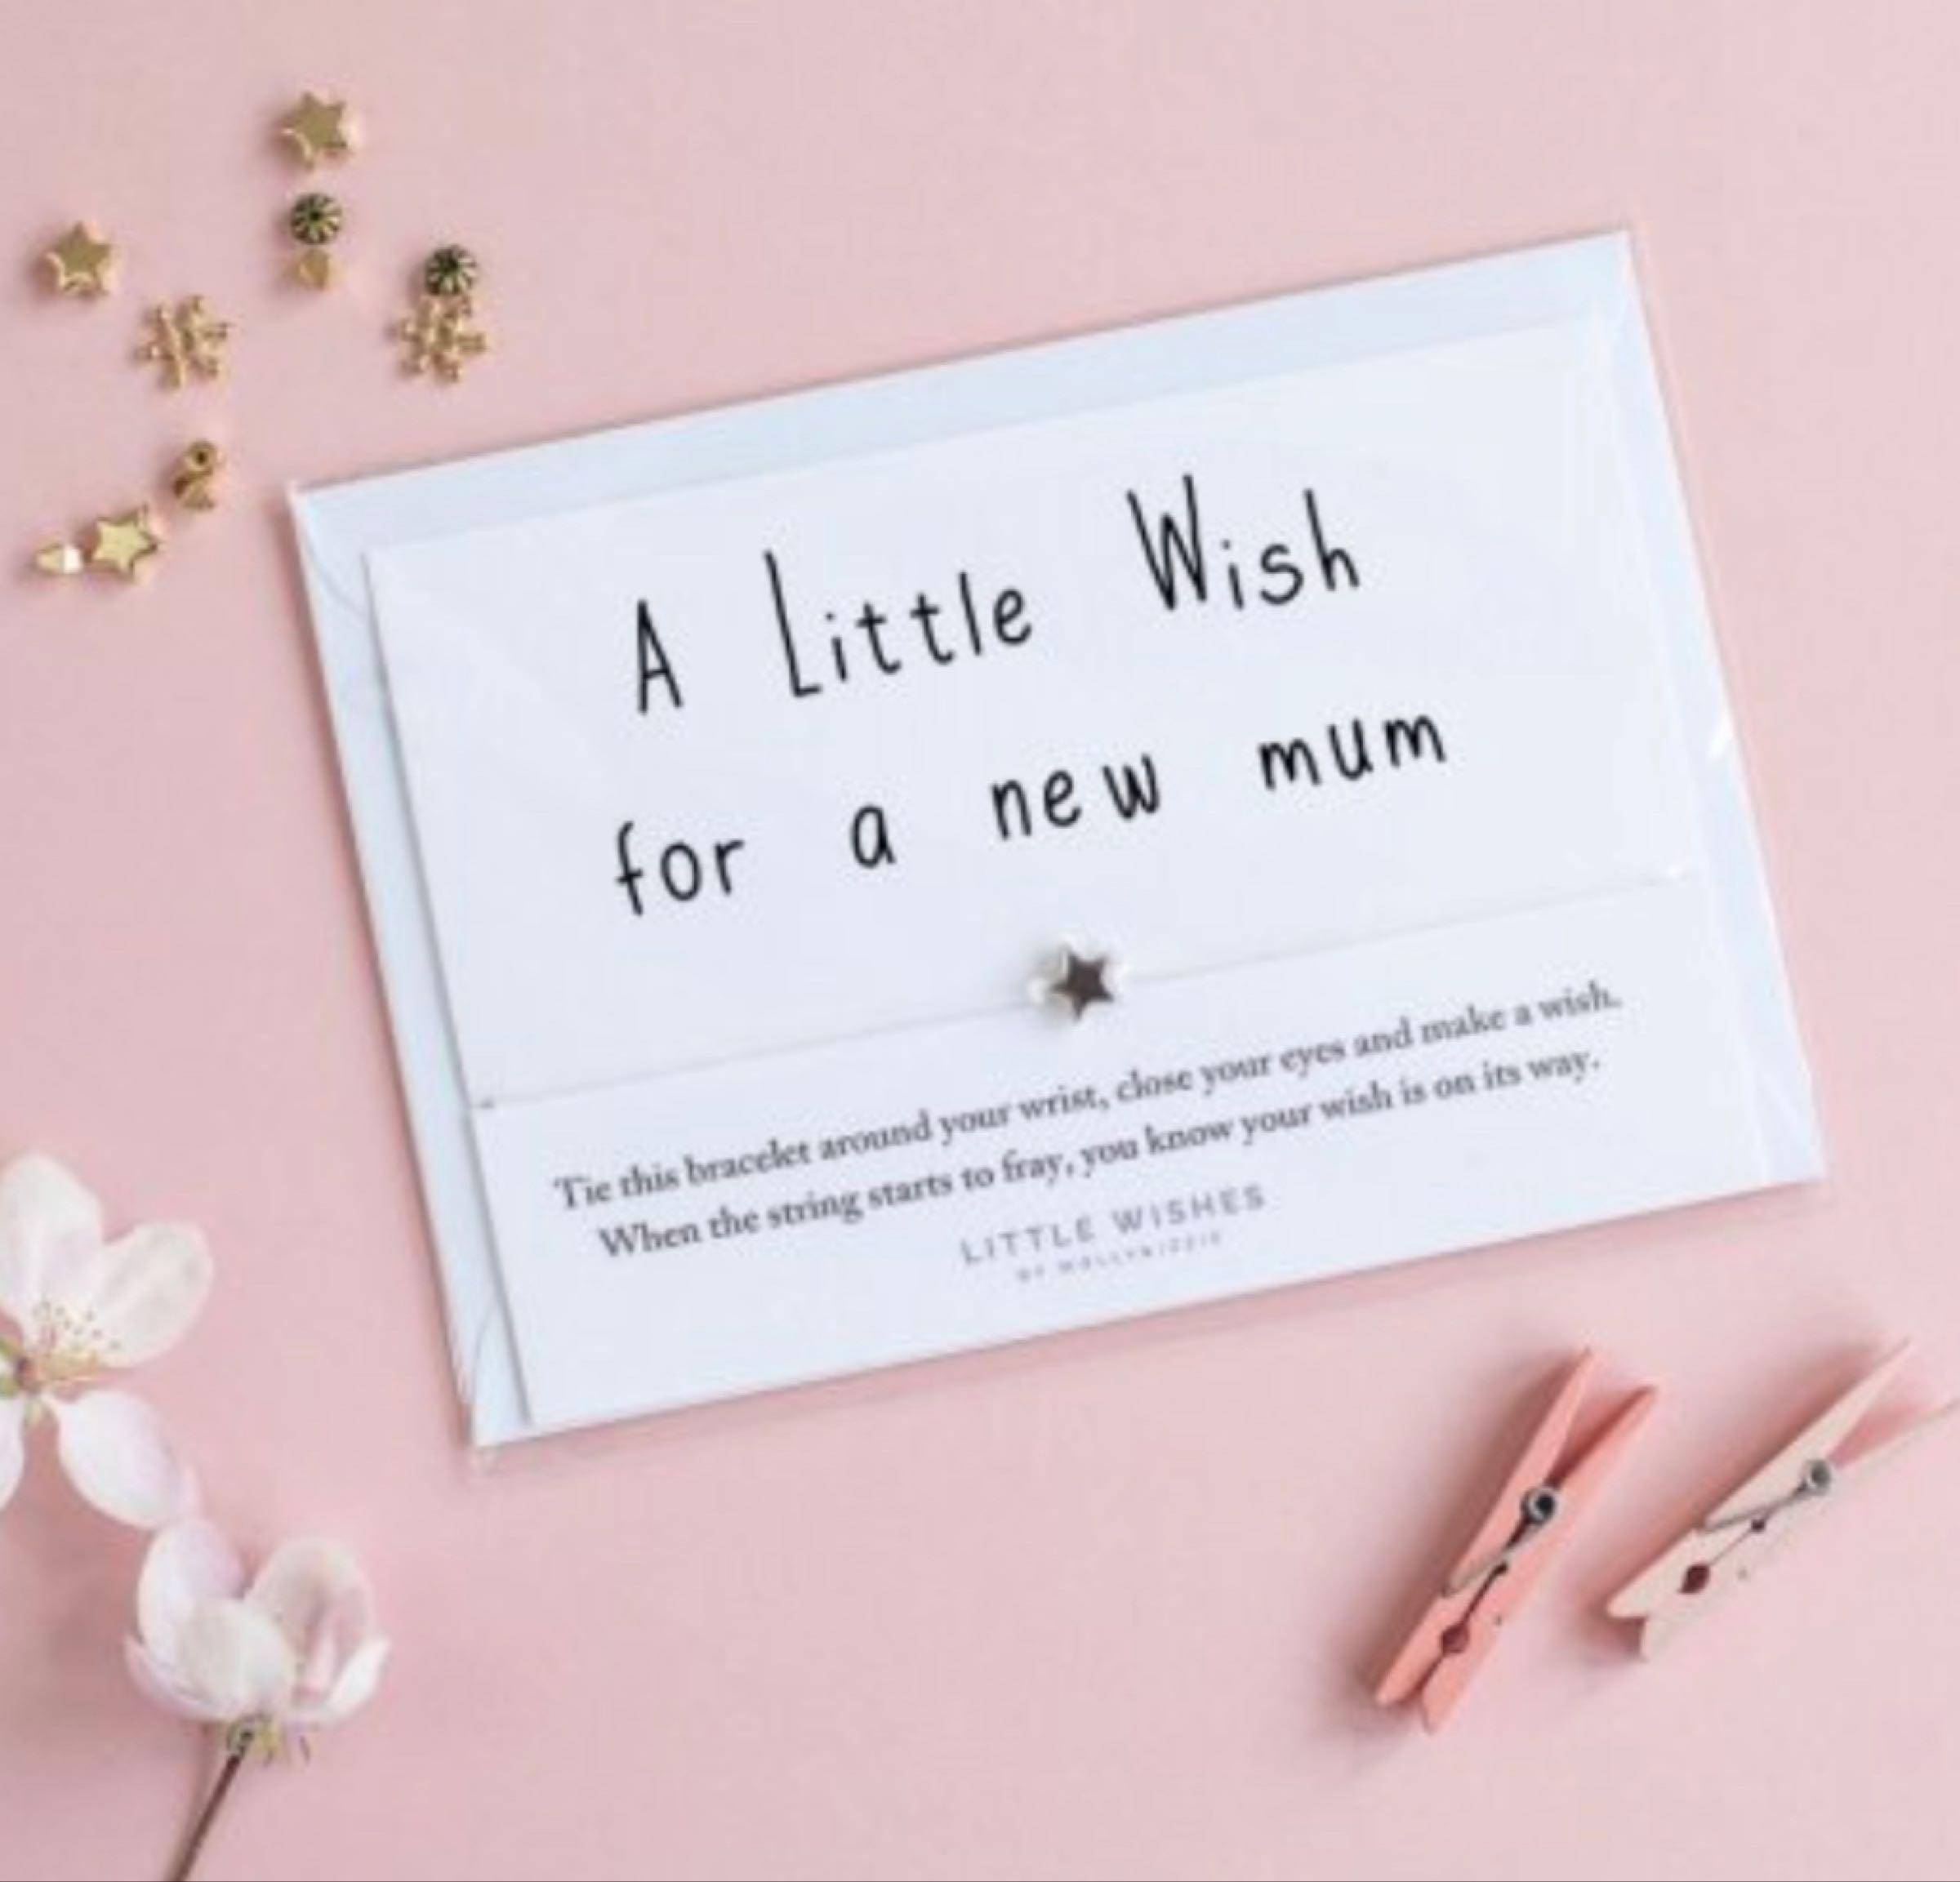 Little wish for new mum wish bracelet